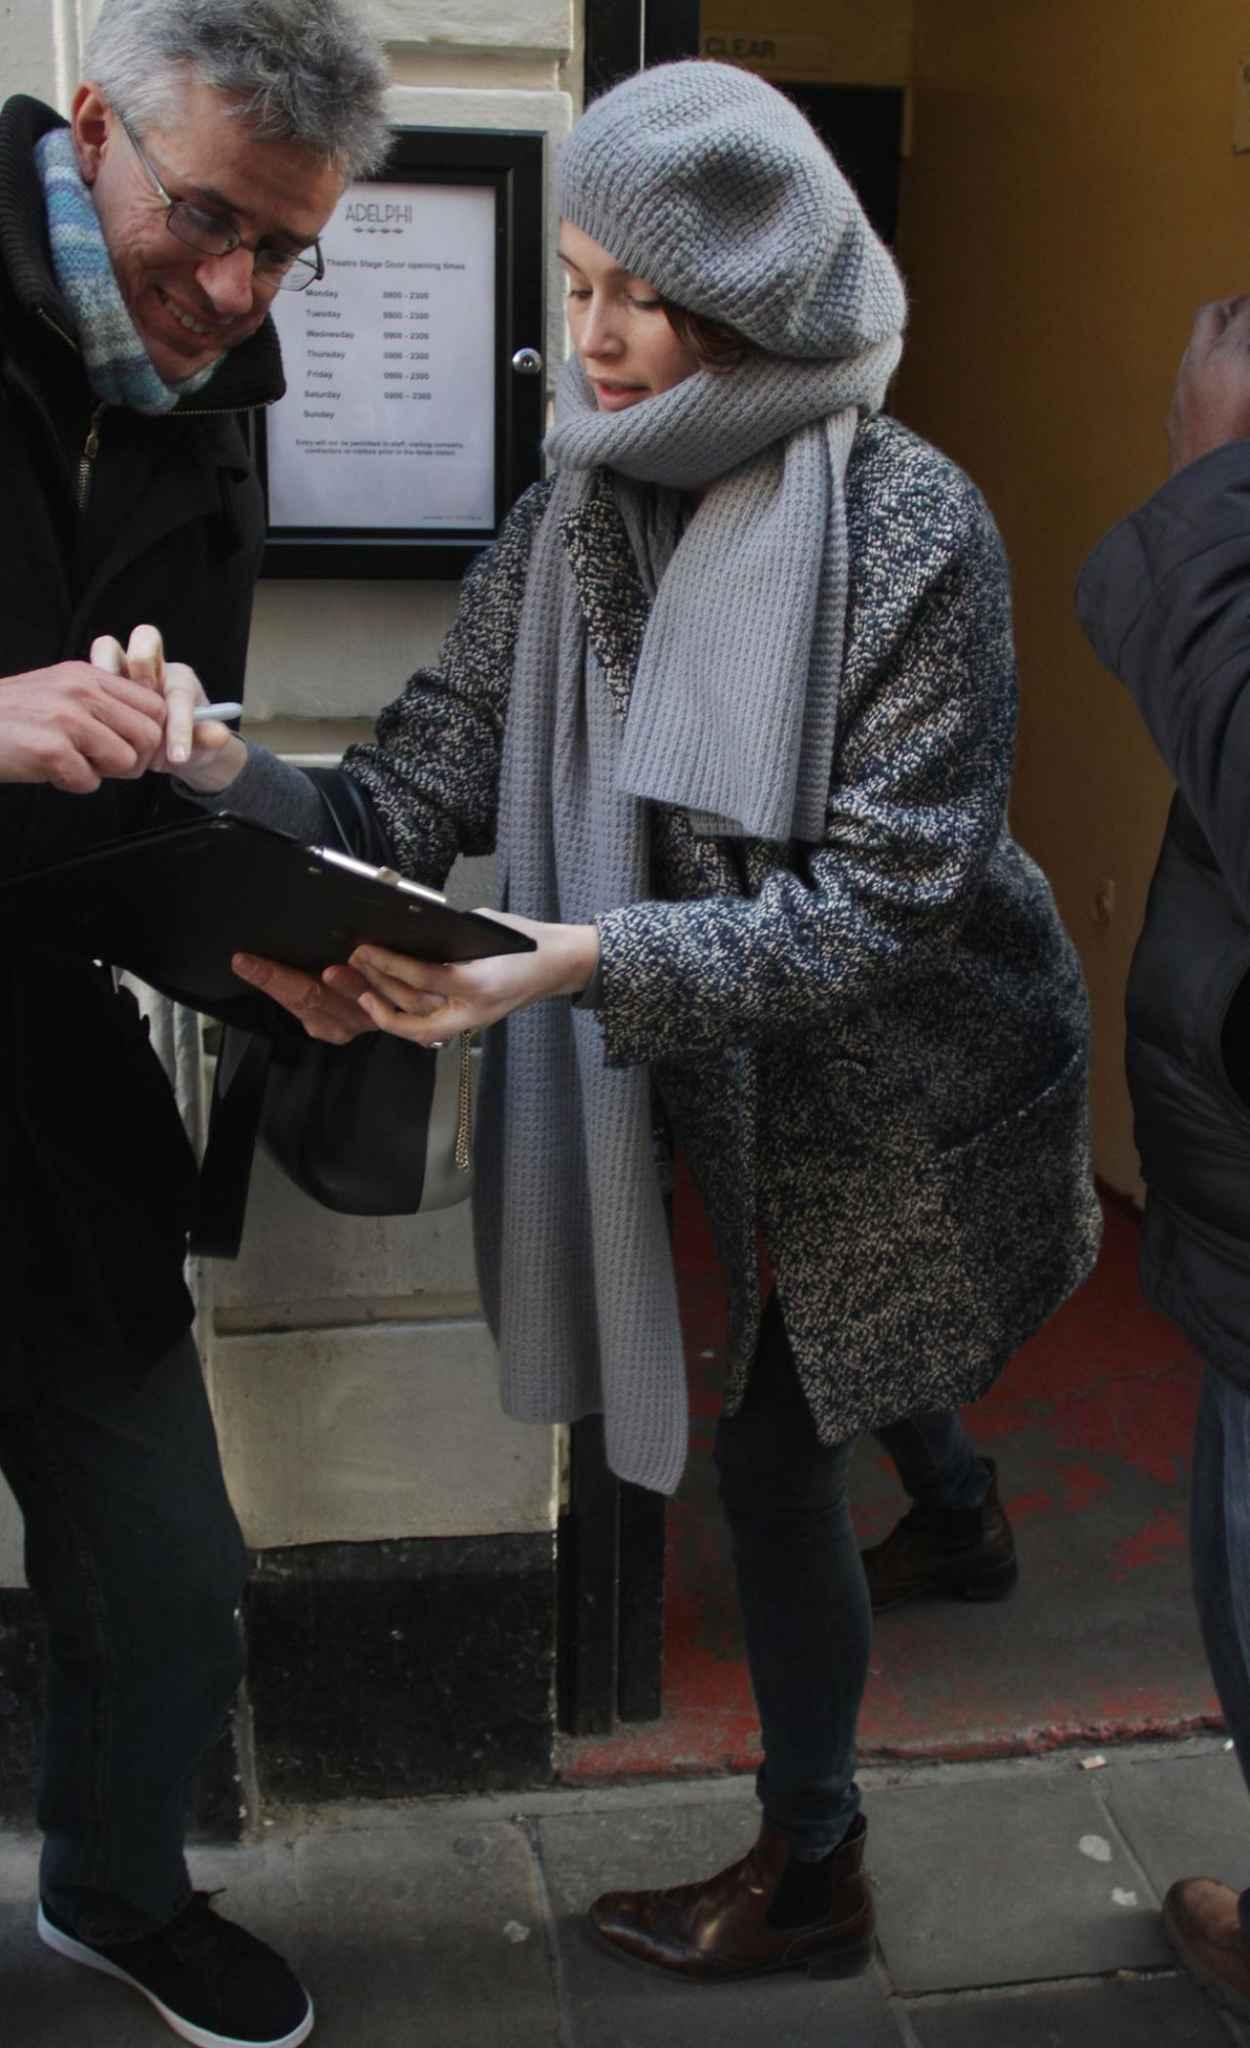 Gemma Arterton Signing Autographs - Adelphi Theatre in London, Dec. 2015-2